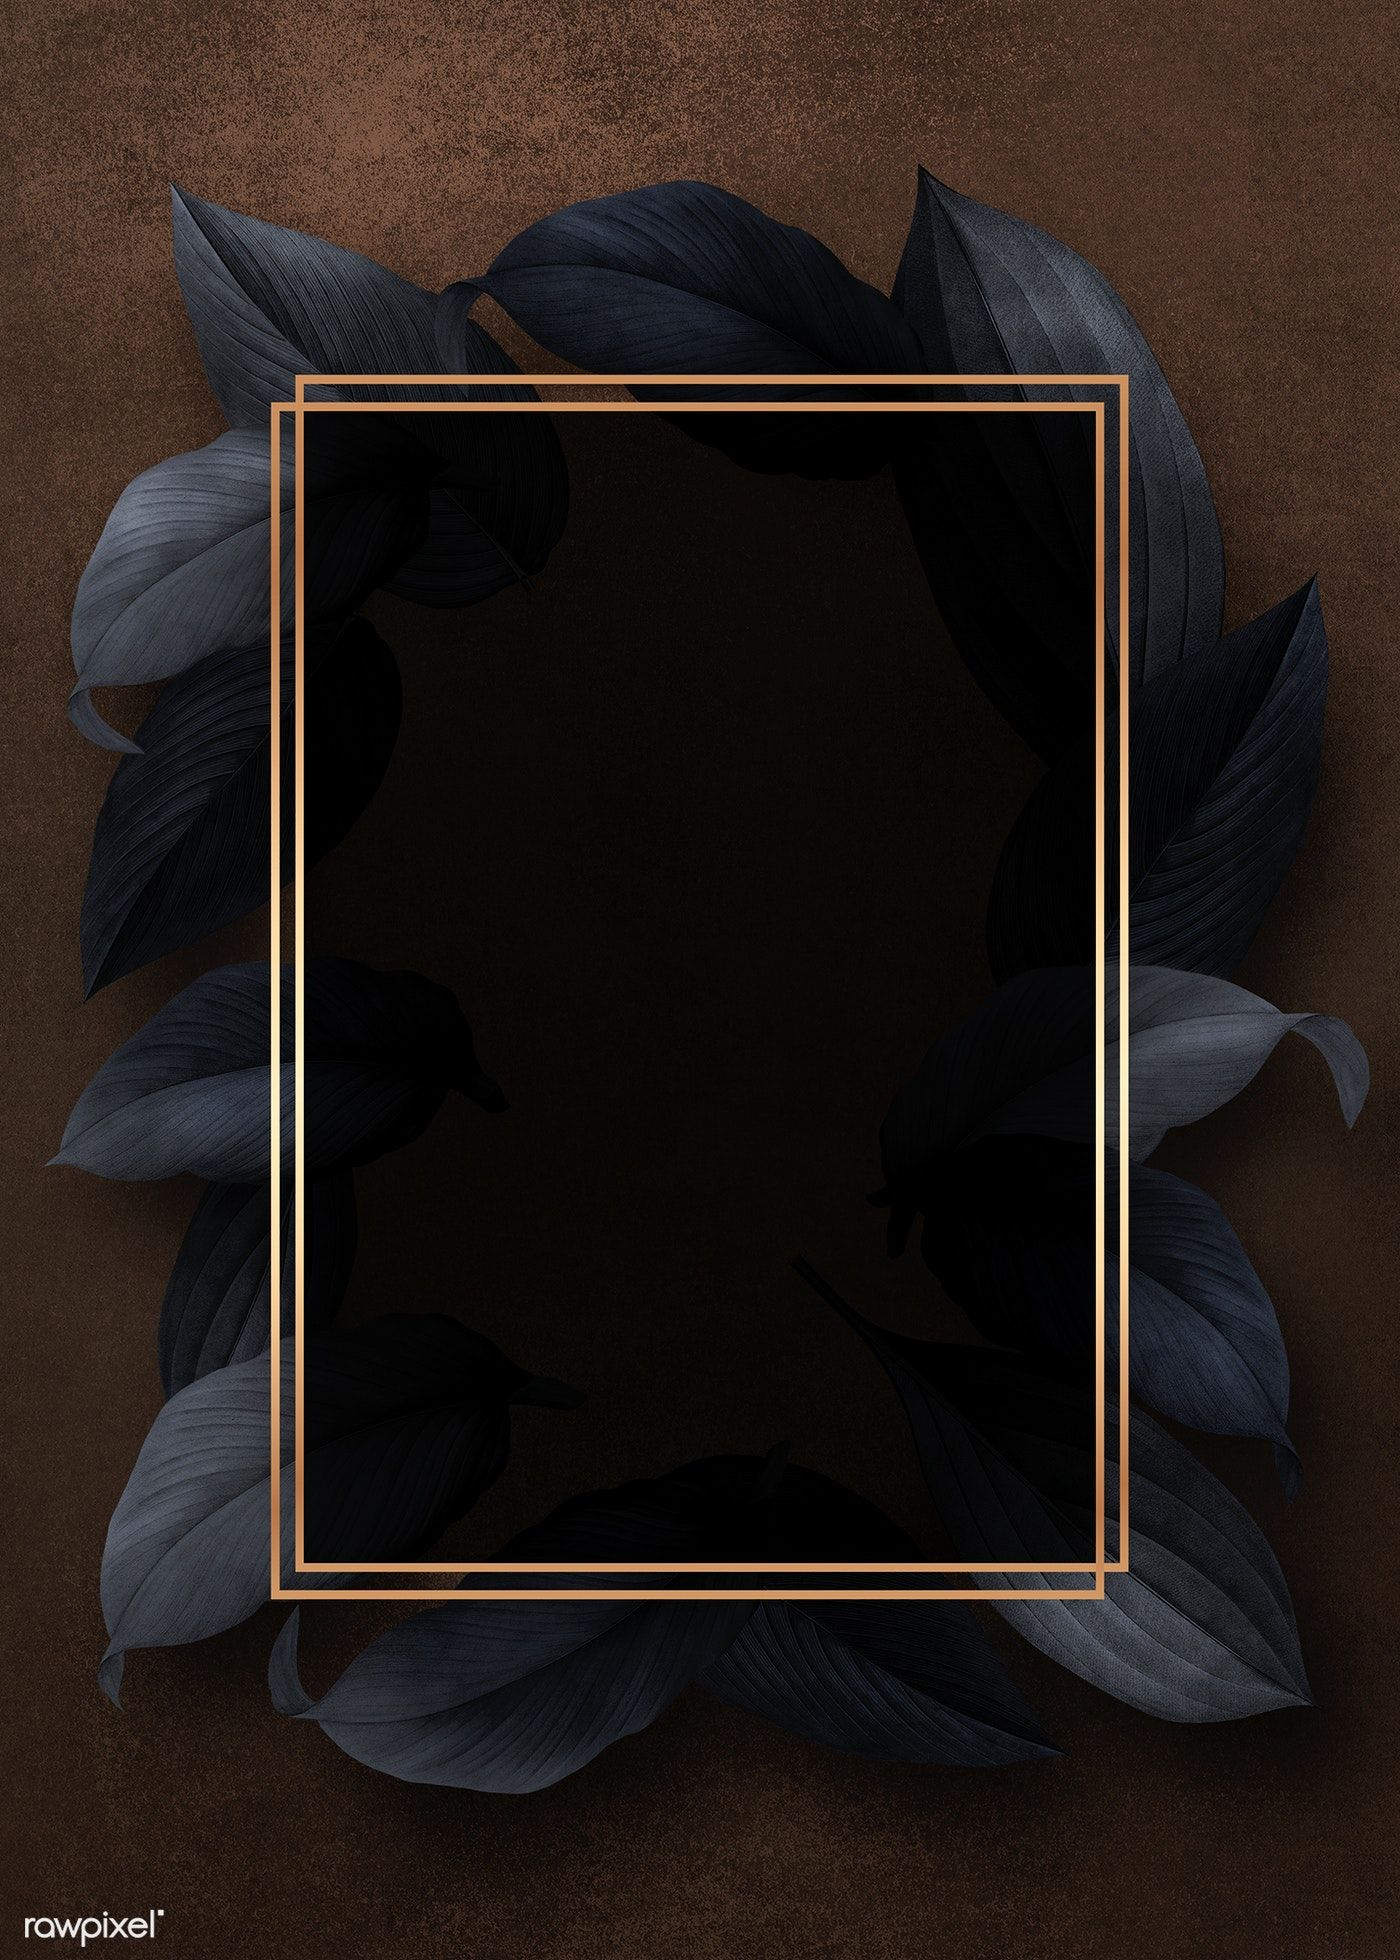 Golden frame on a black leafy background illustration   free image by rawpixel.com / Kappy Kappy